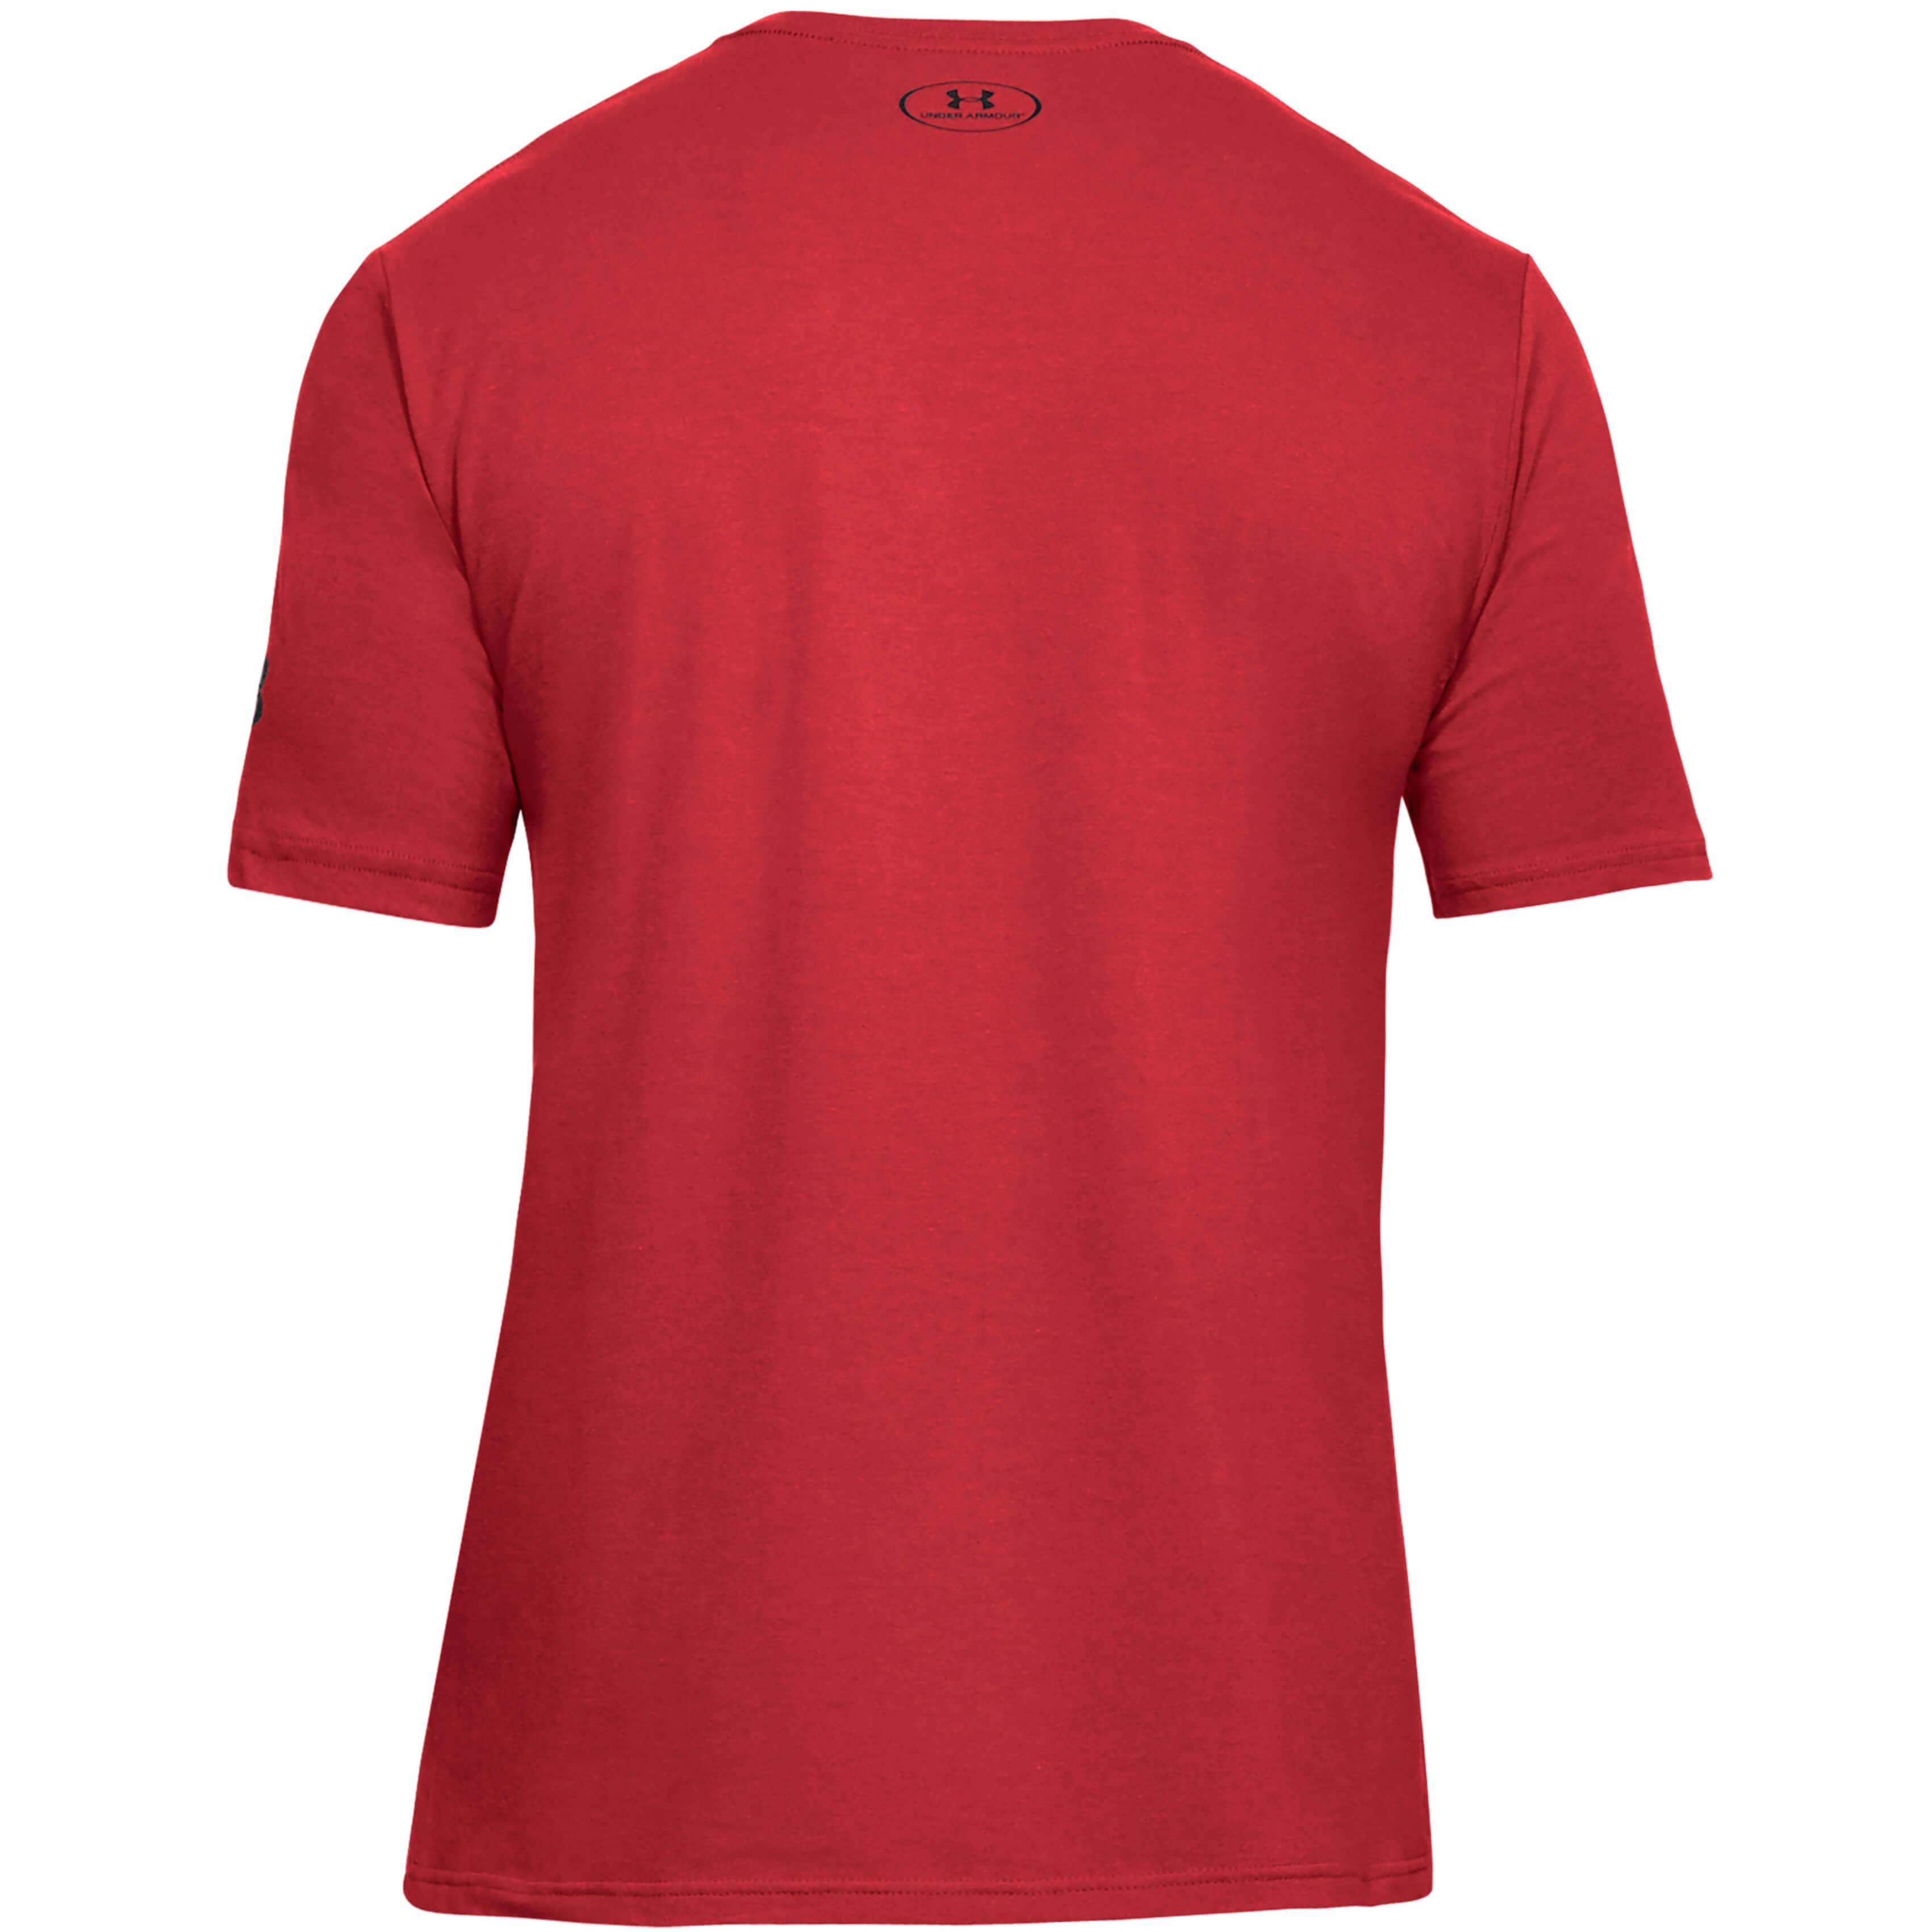 Under Armour Mens UA BBall FILO Short Sleeve Gym Training Sports T Shirt